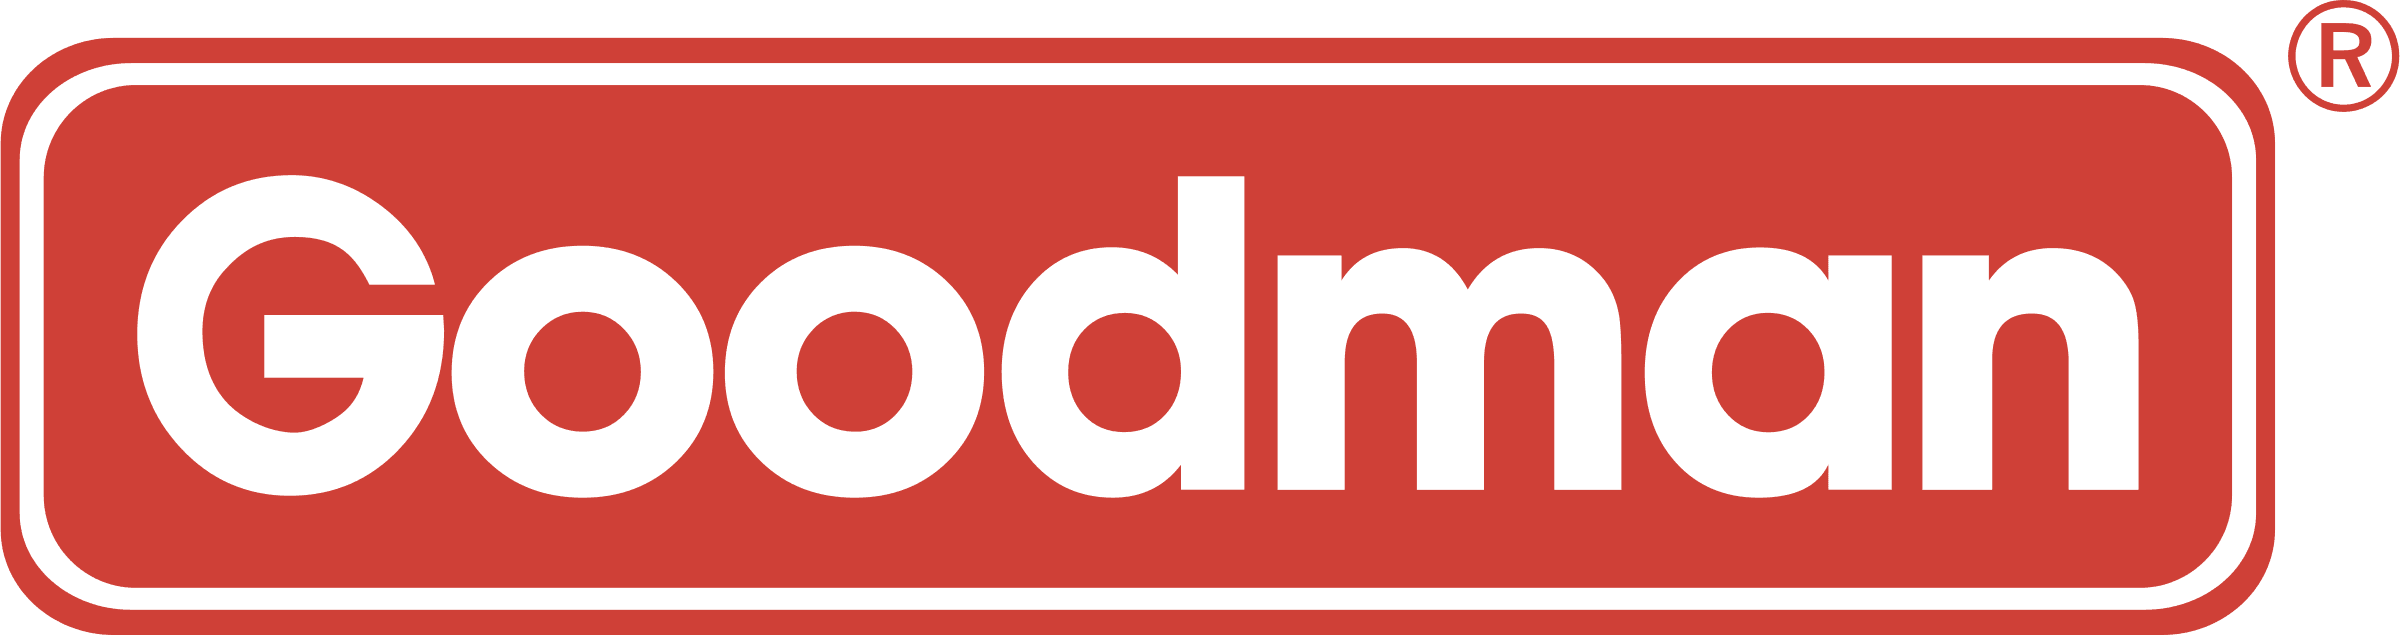 Authorized Goodman Installer